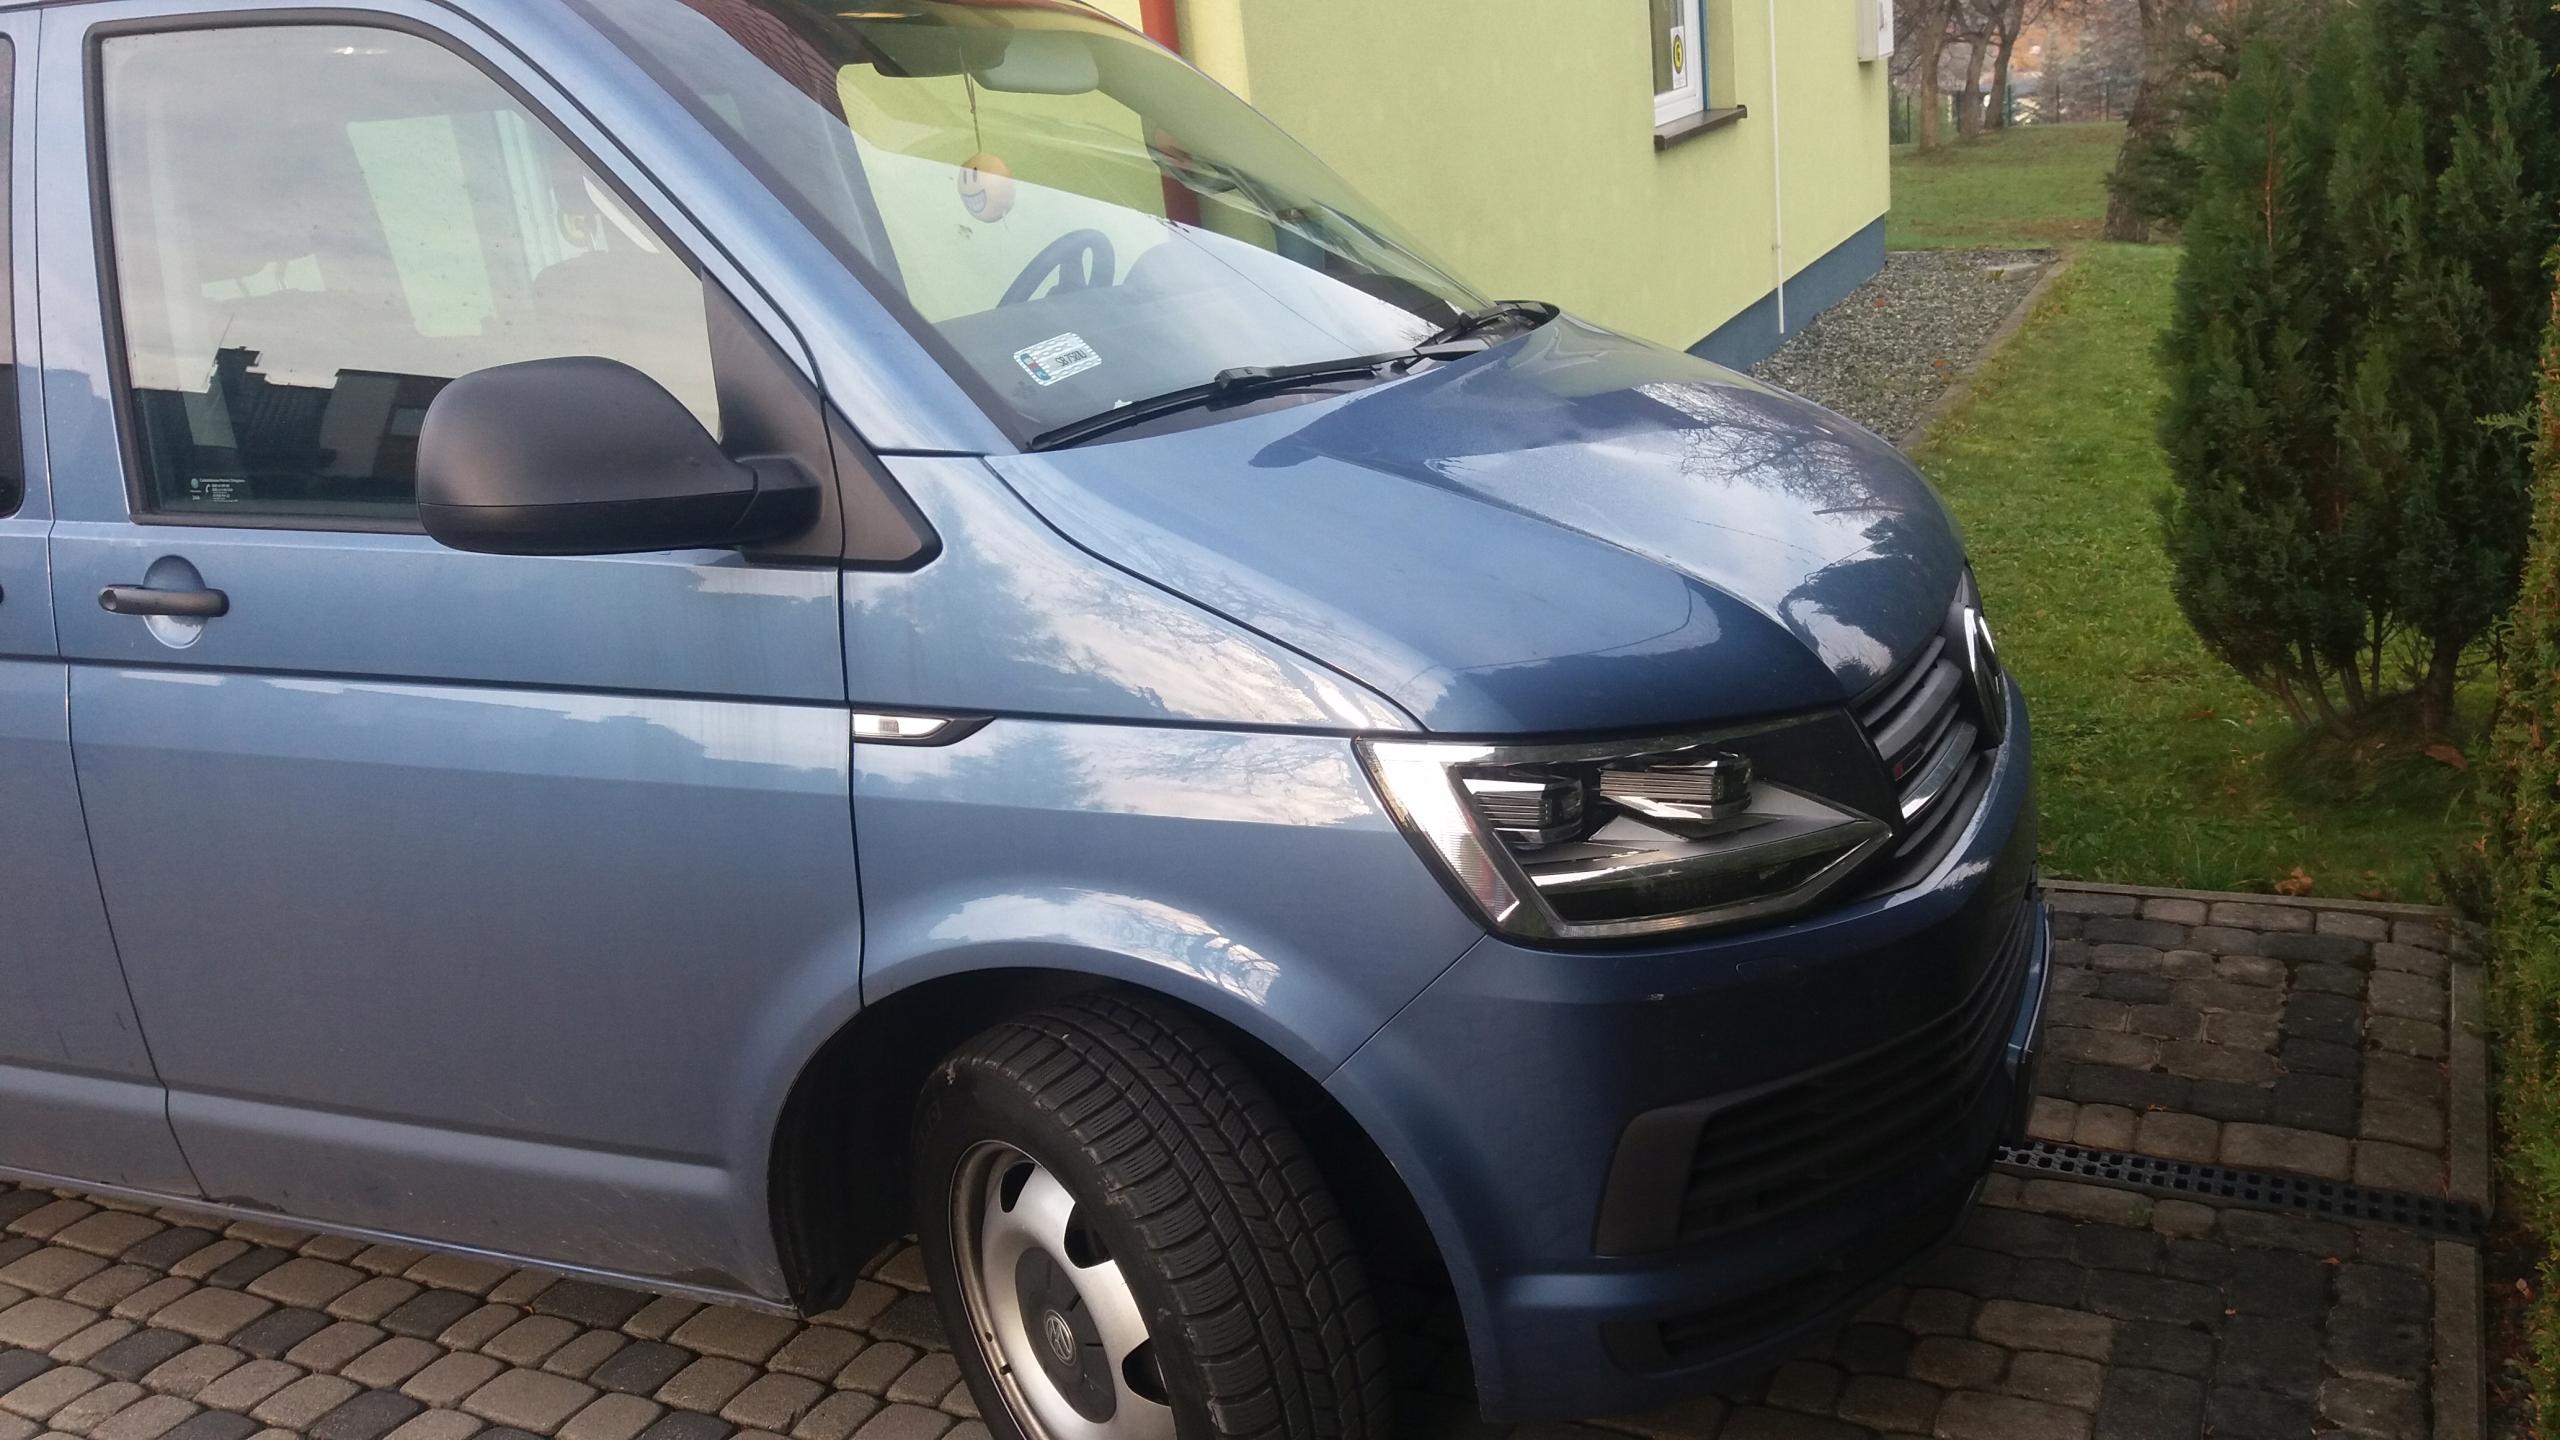 Topnotch samochod osobowy volkswagen 7 osobowy multiwan - 7690072701 RX94